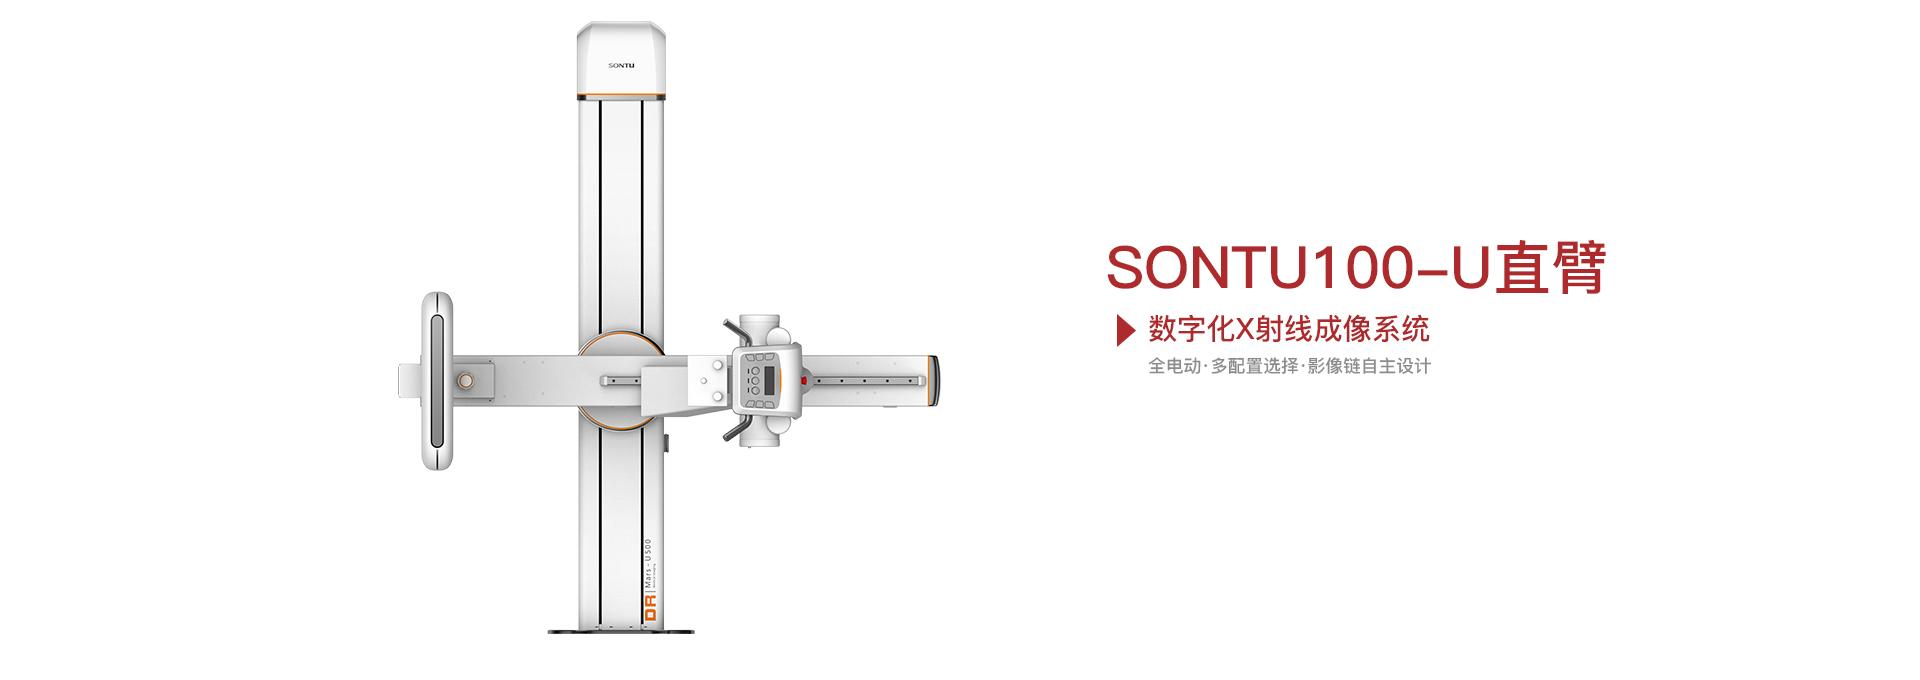 Shenzhen Shentu Medical Imaging Equipment Co., Ltd.